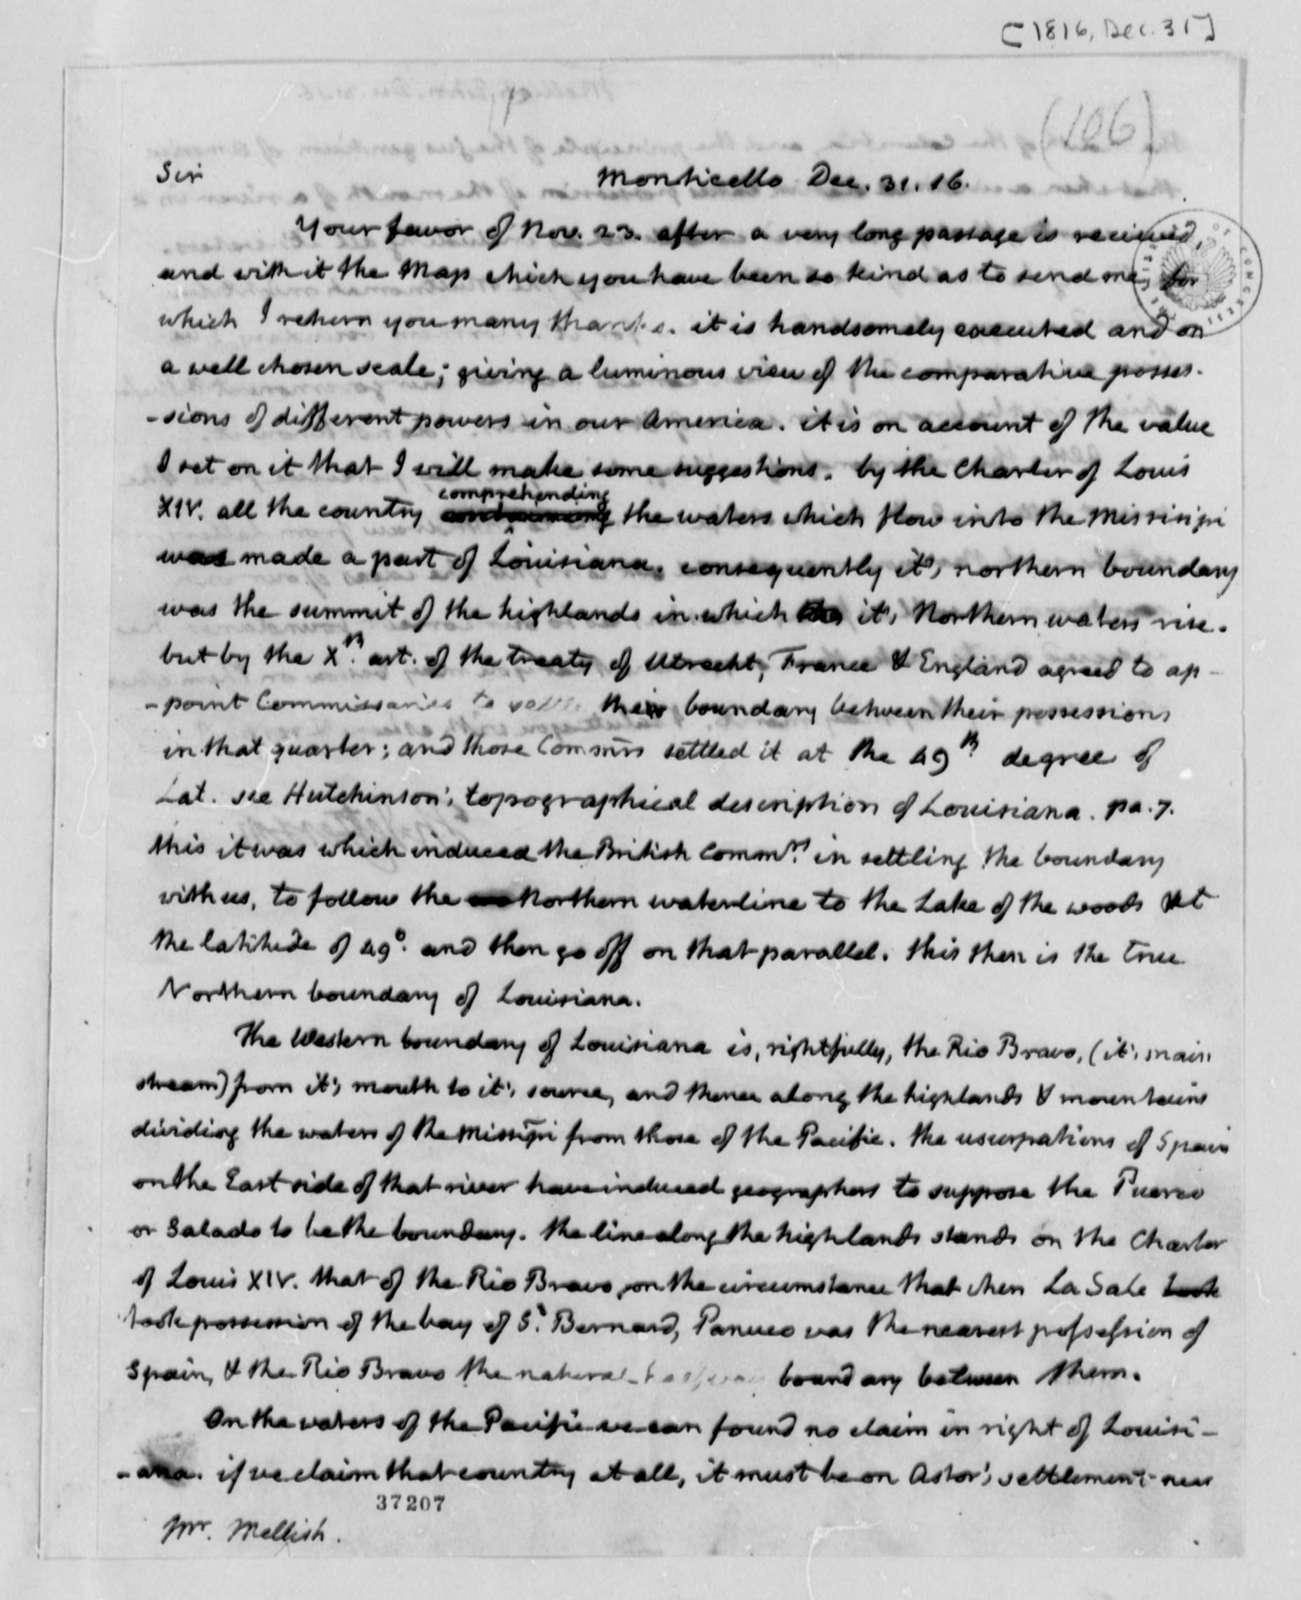 Thomas Jefferson to John Melish, December 31, 1816